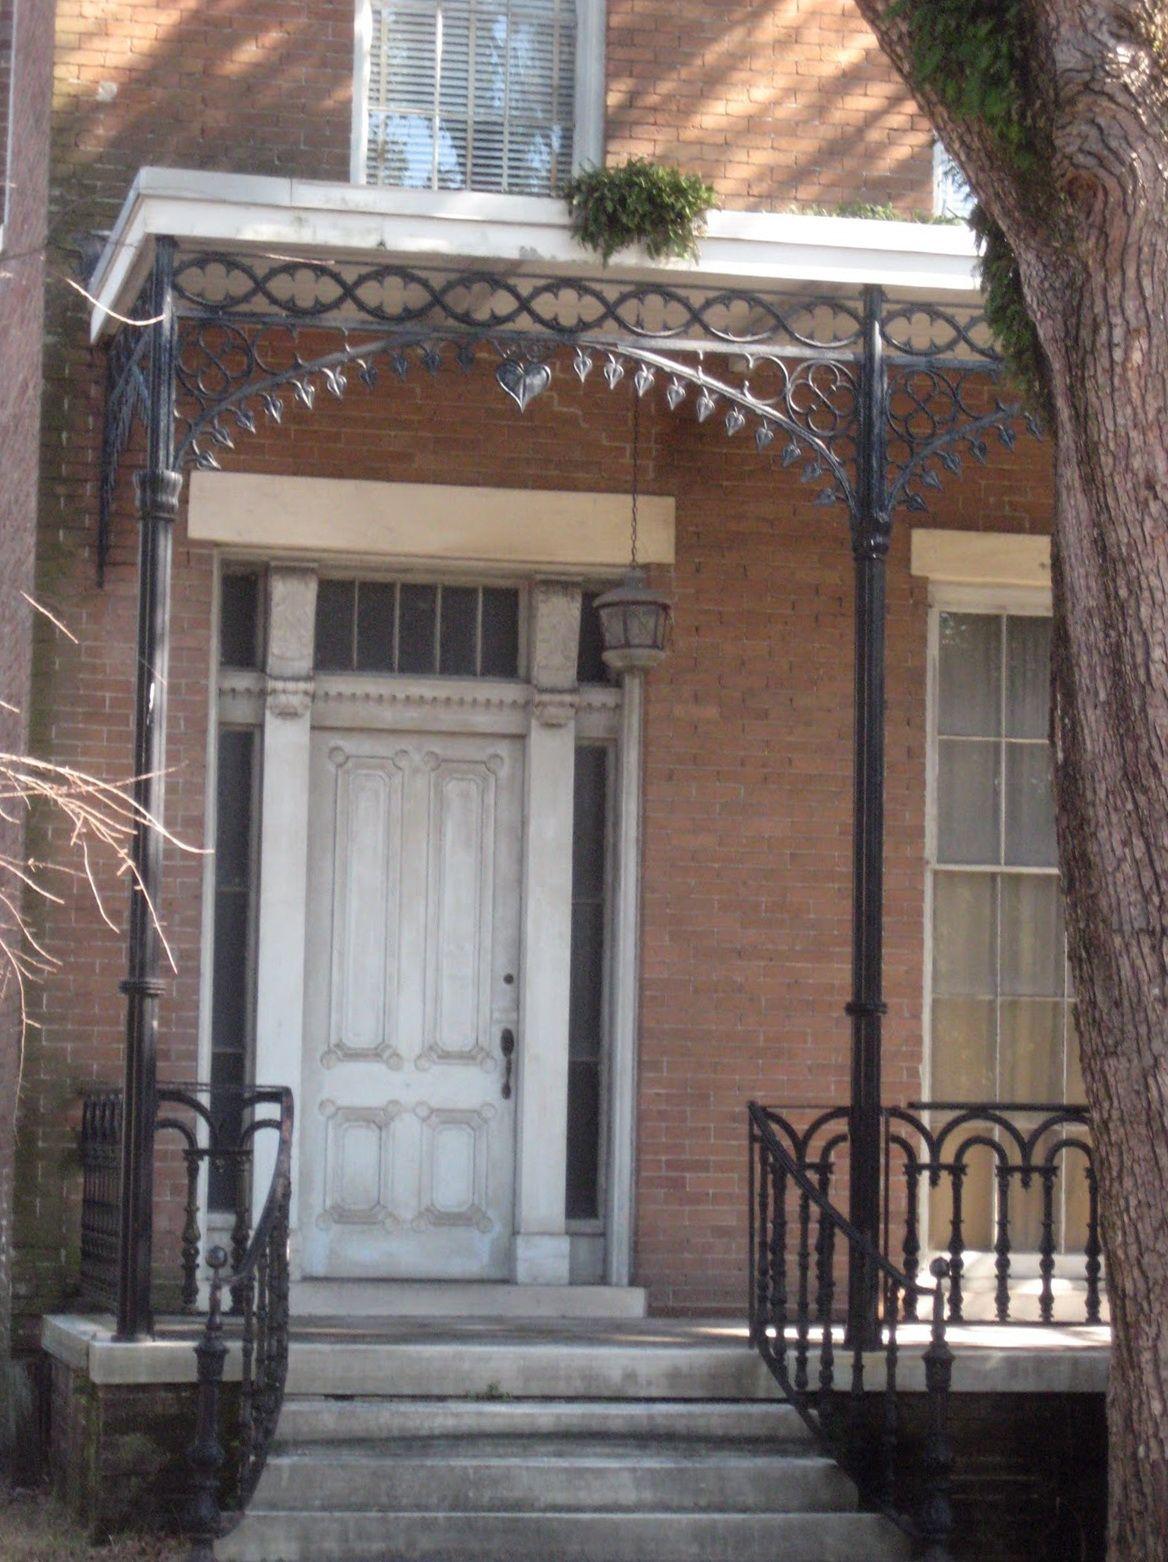 Wrought Iron Porch Columns For Sale Iron Pinterest Porch Columns Wroug